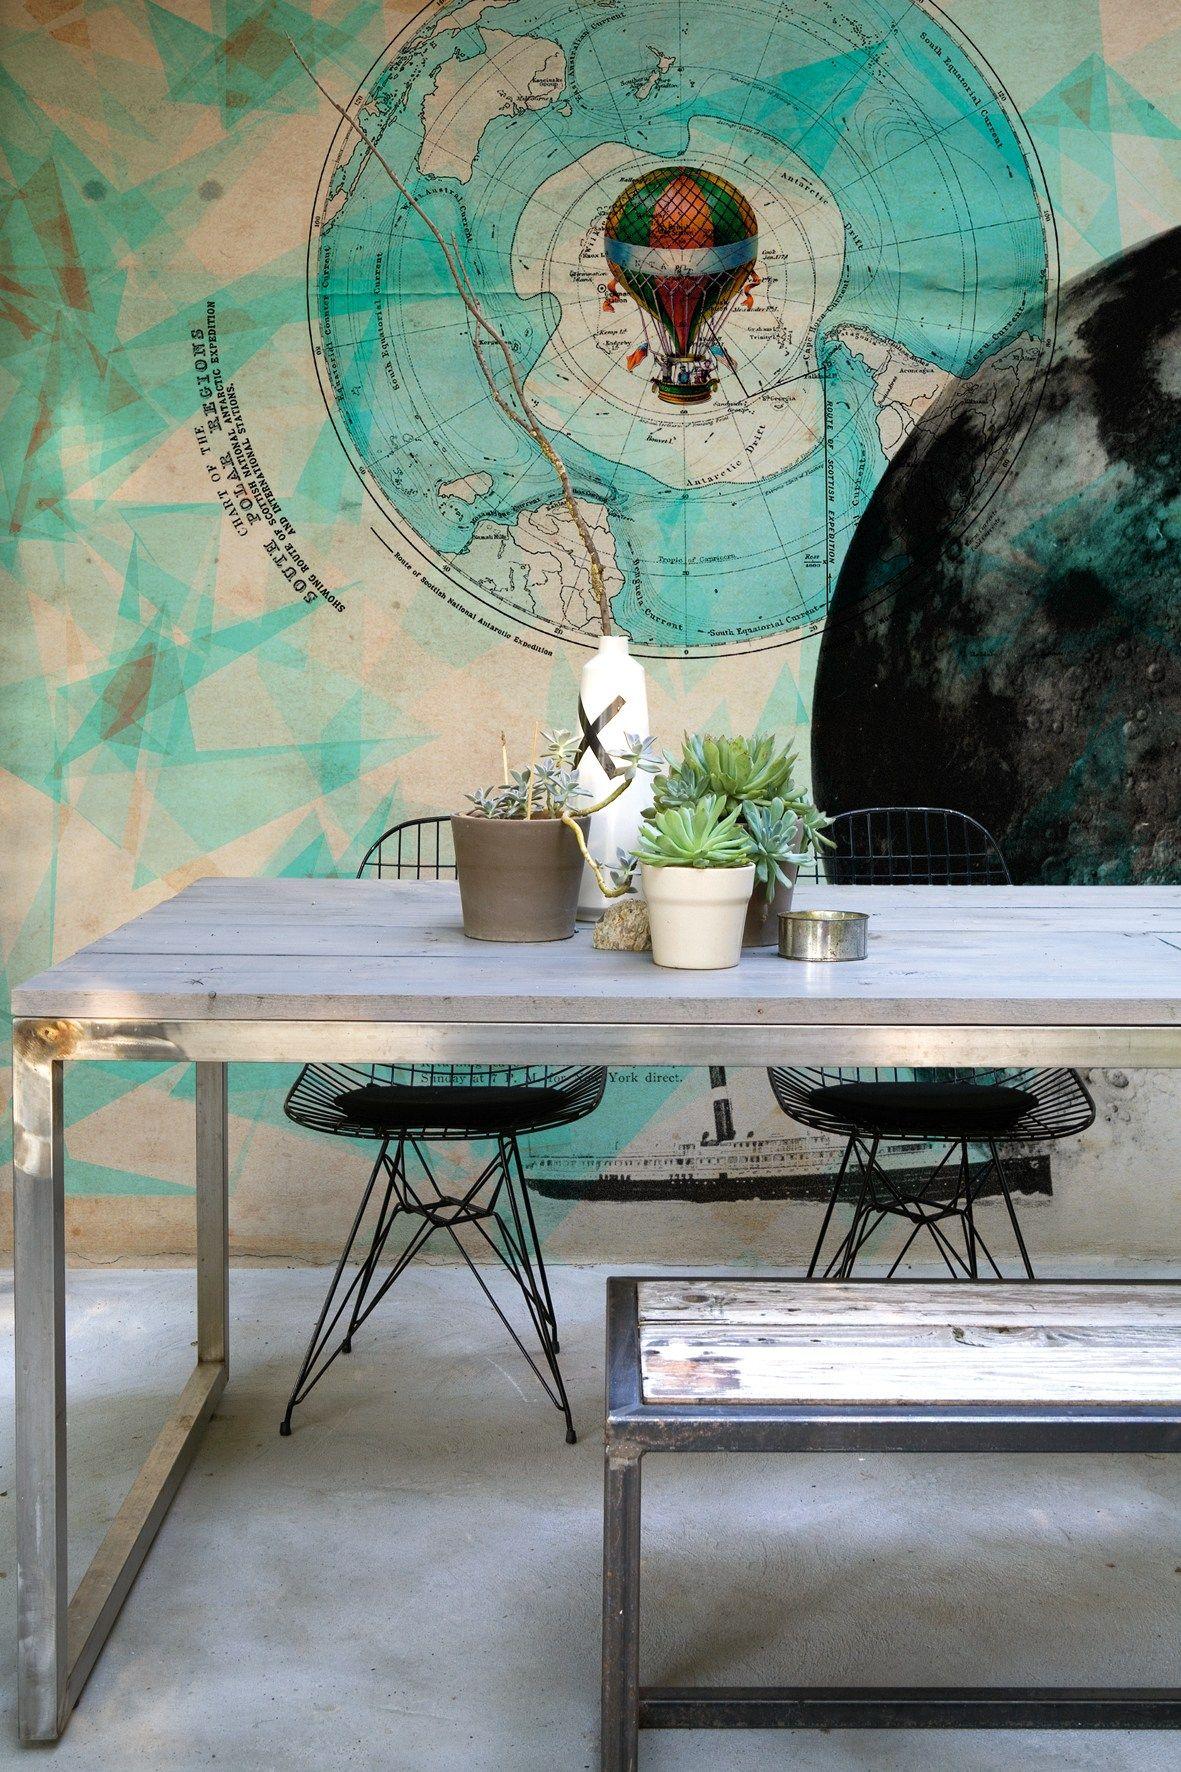 man on the moon by wall dec design wladimiro bendandi christian benini. Black Bedroom Furniture Sets. Home Design Ideas